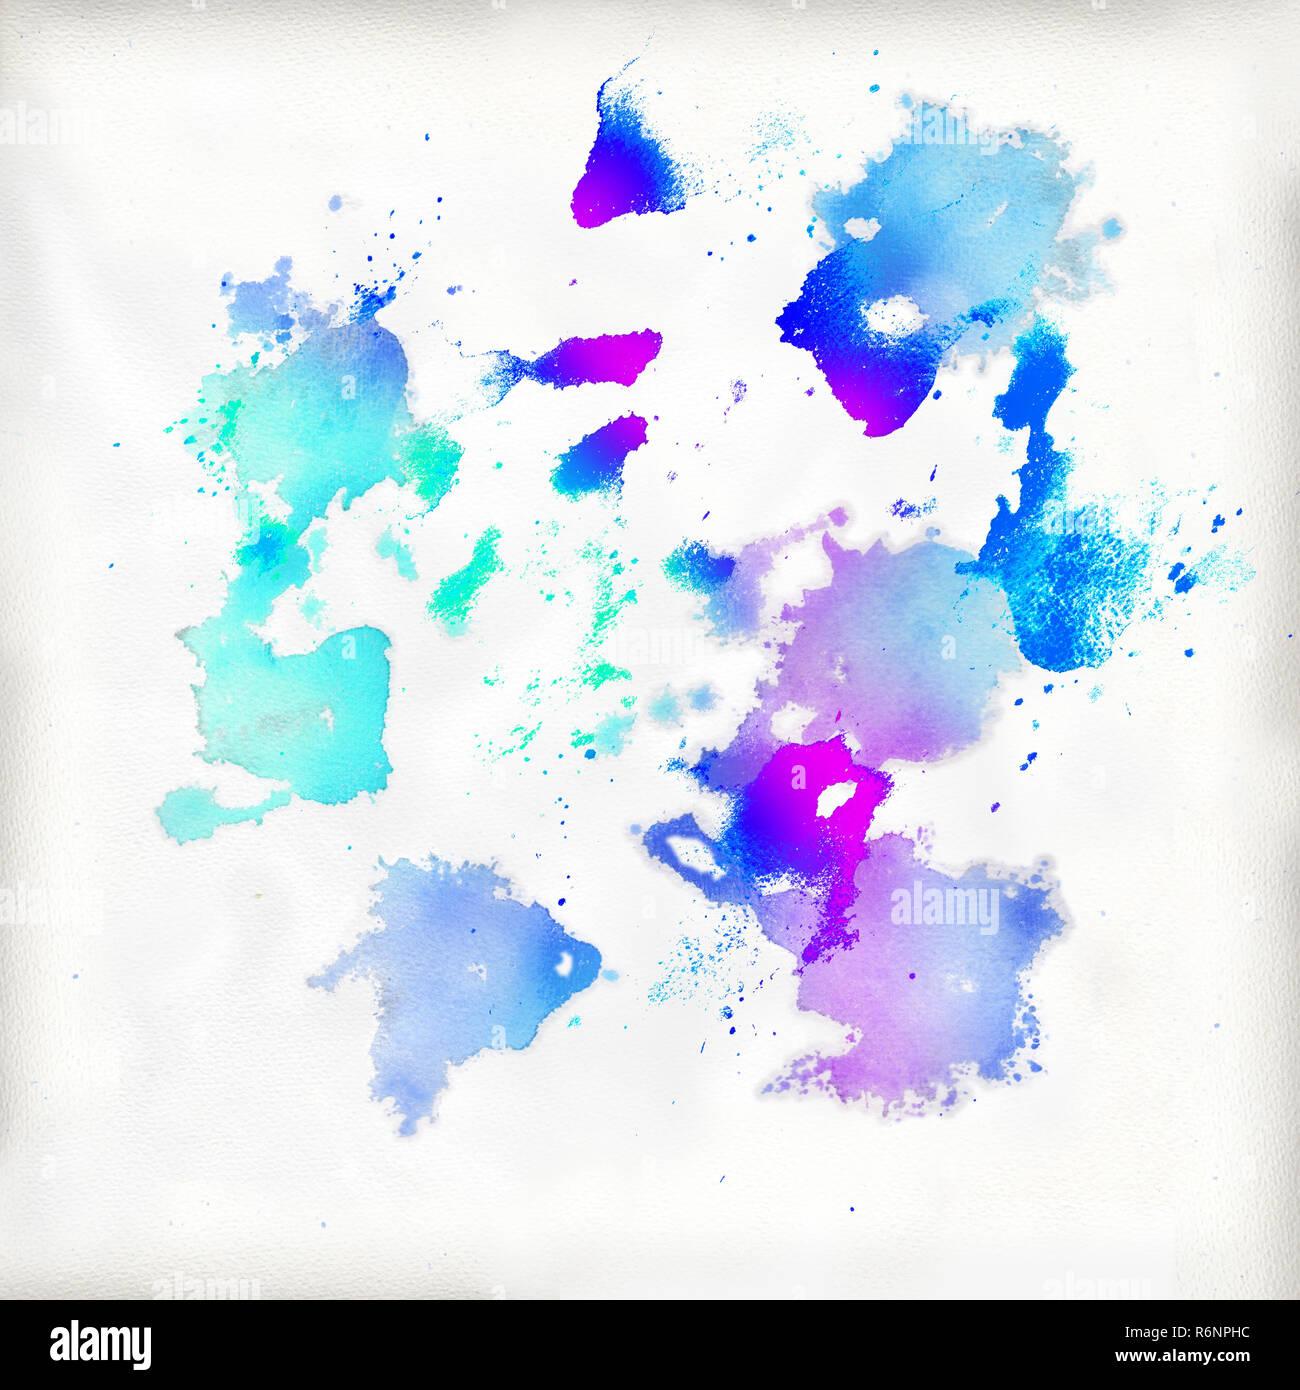 Viele Farbtupfer auf einem aquarell papier Stockbild